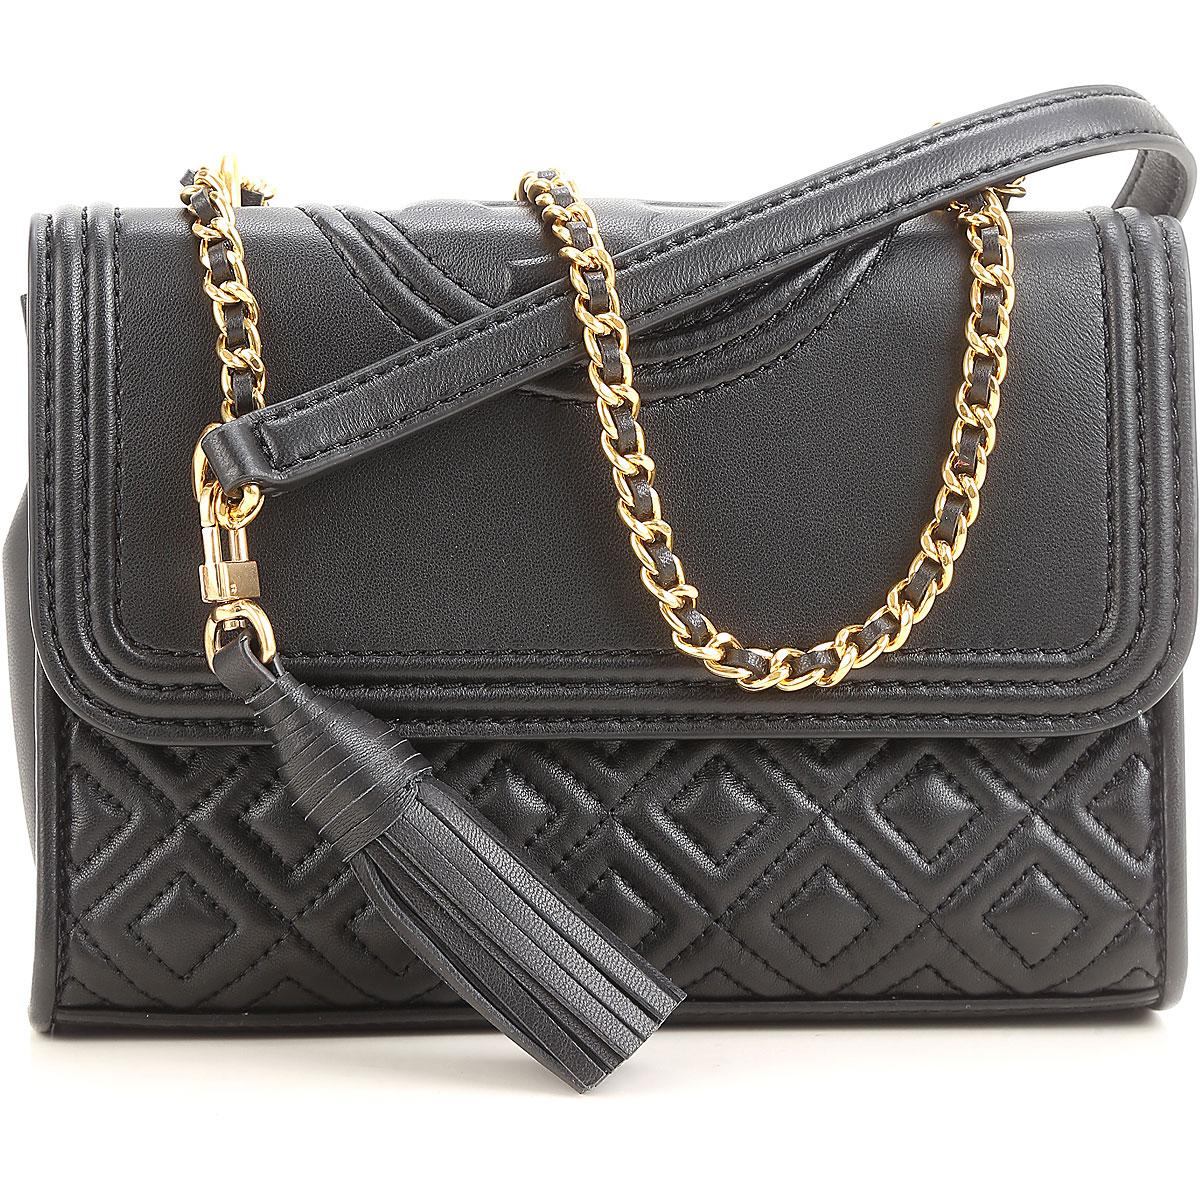 Tory Burch Shoulder Bag for Women, Black, Leather, 2017 USA-432918